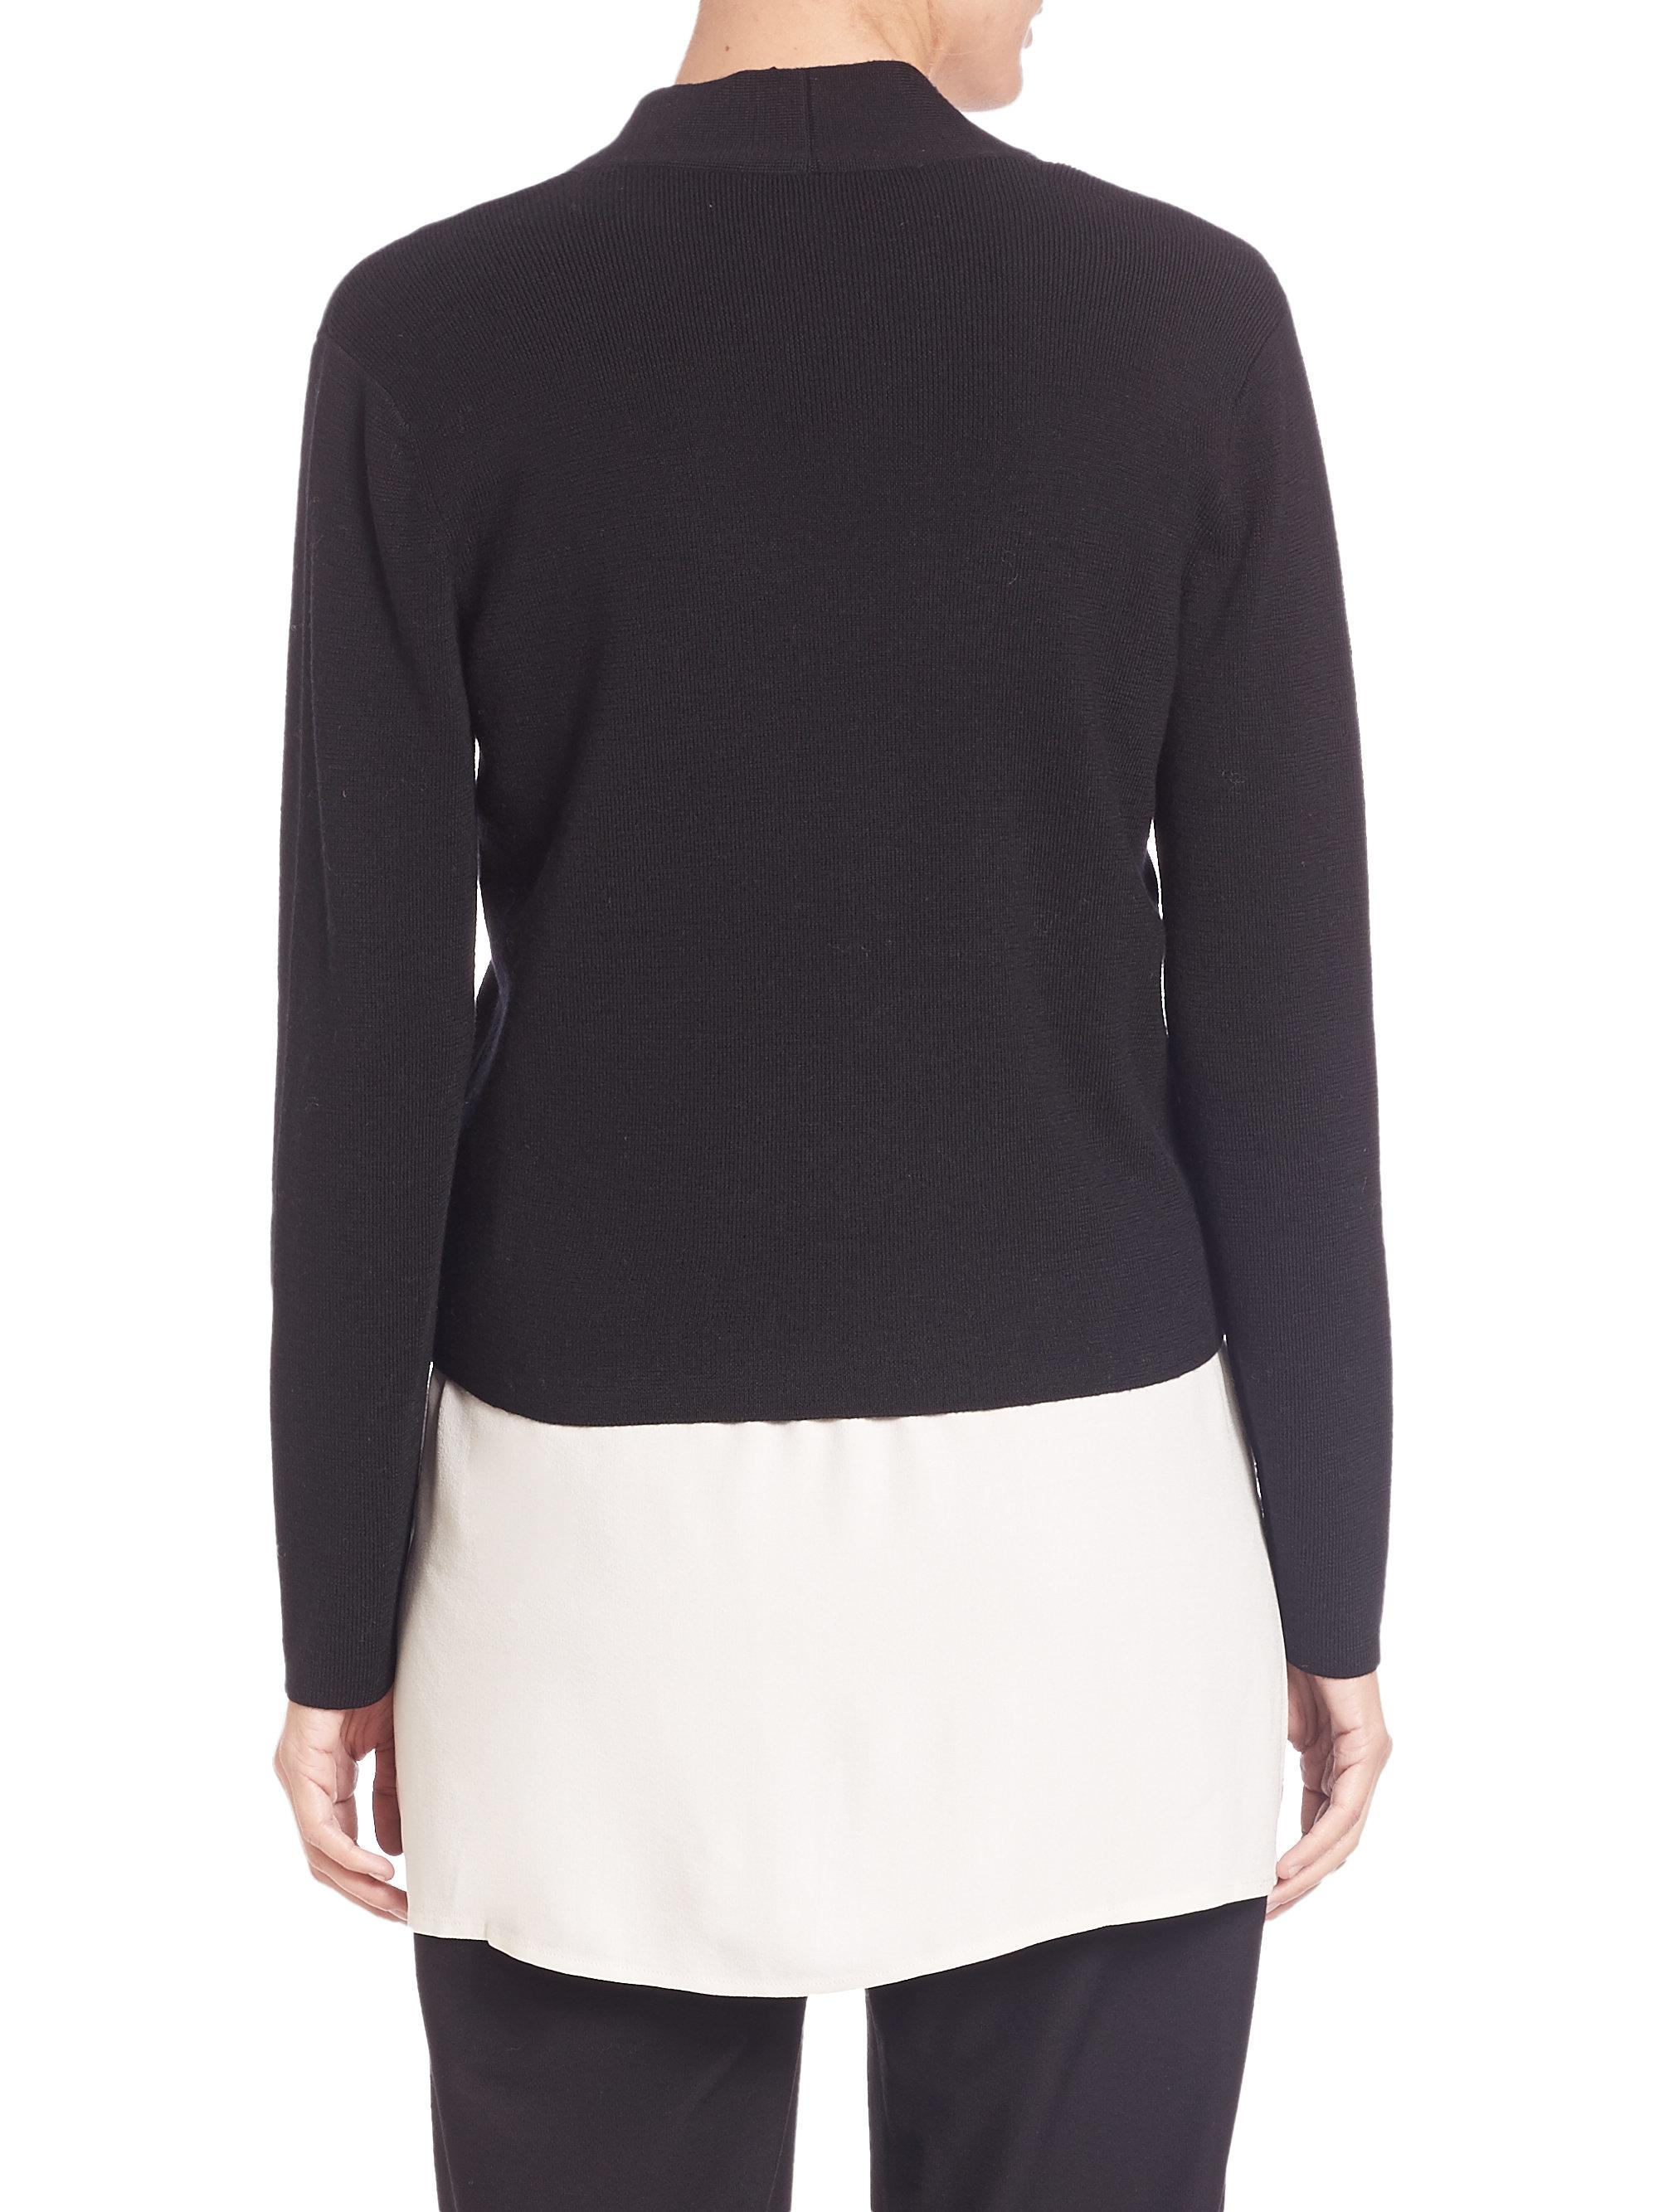 Eileen fisher Merino Wool Ribbed Short Cardigan in Black | Lyst